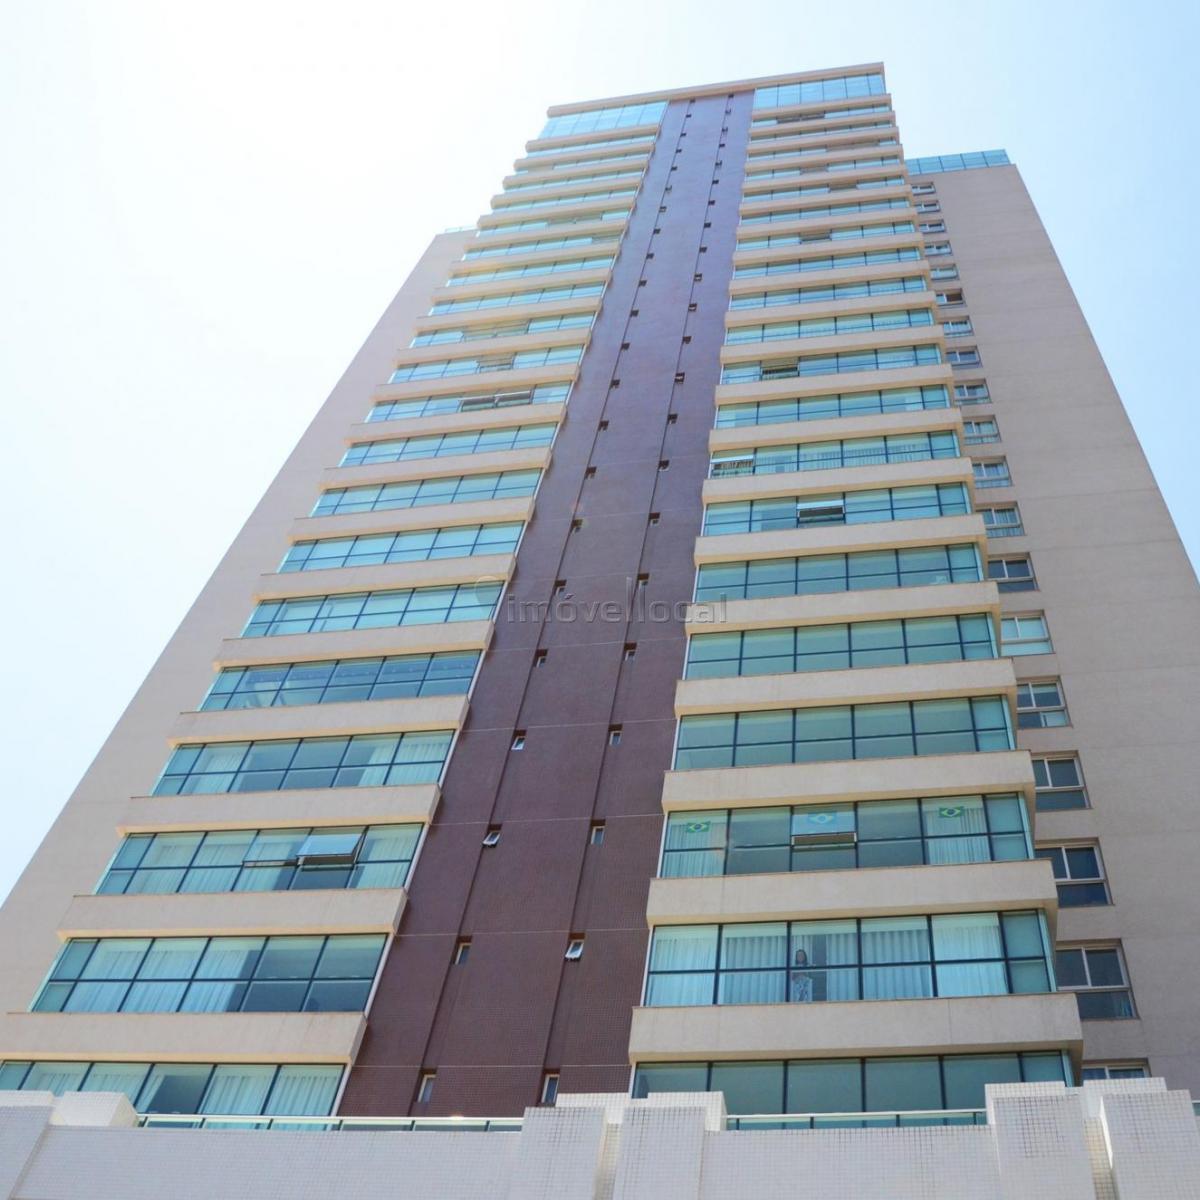 http://www.infocenterhost2.com.br/crm/fotosimovel/454222/106023371-apartamento-curitiba-vila-izabel.jpg